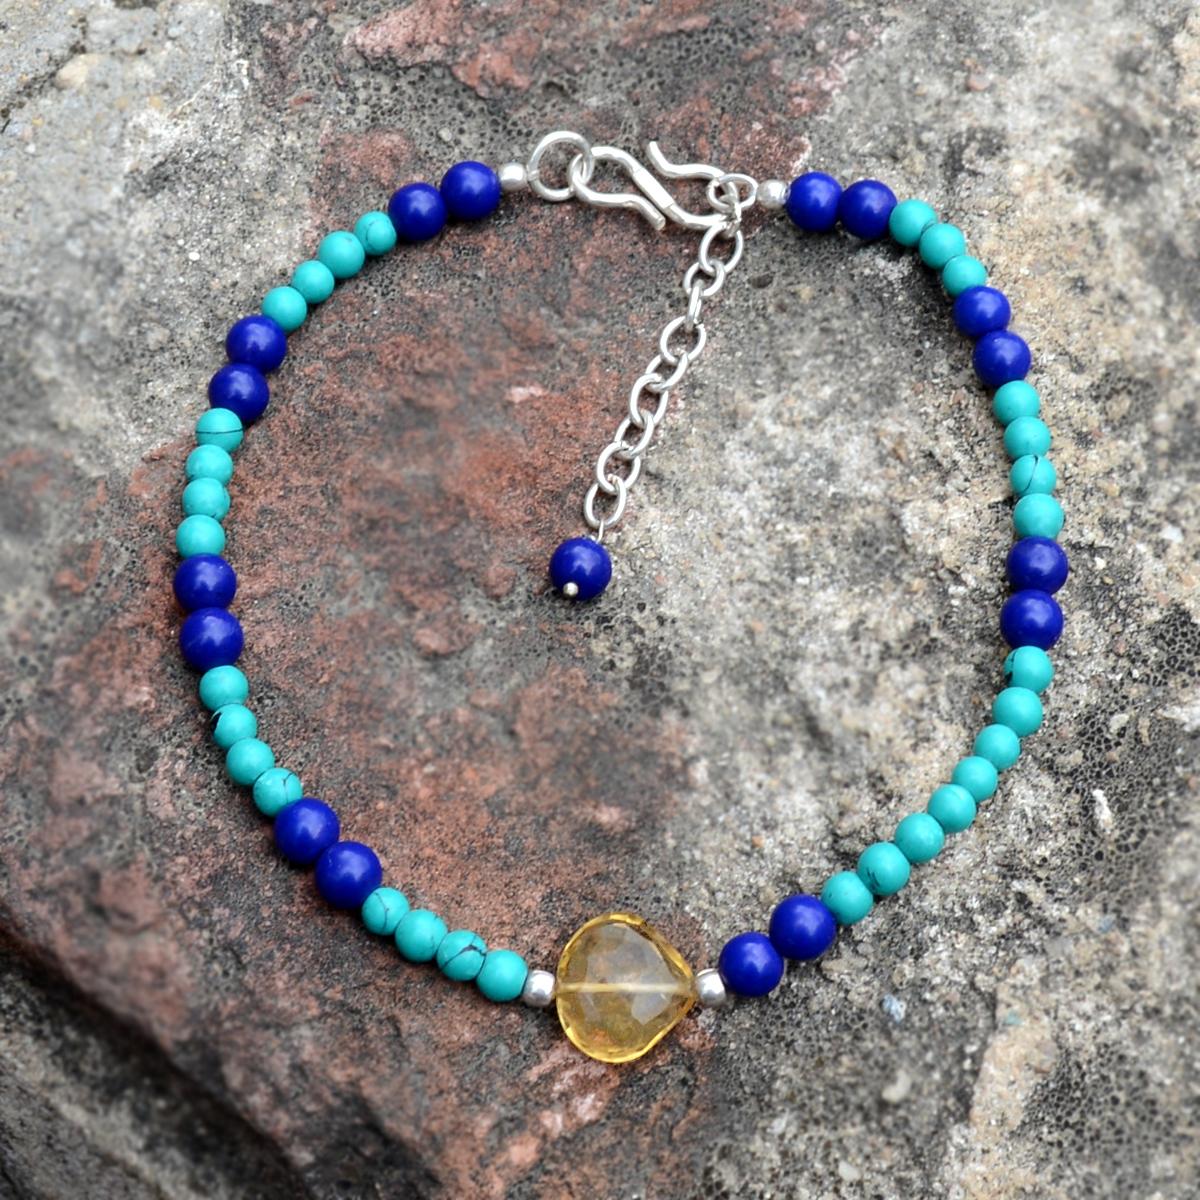 Citrine, Turquoise & Manmade Lapis Bracelet PG-156338